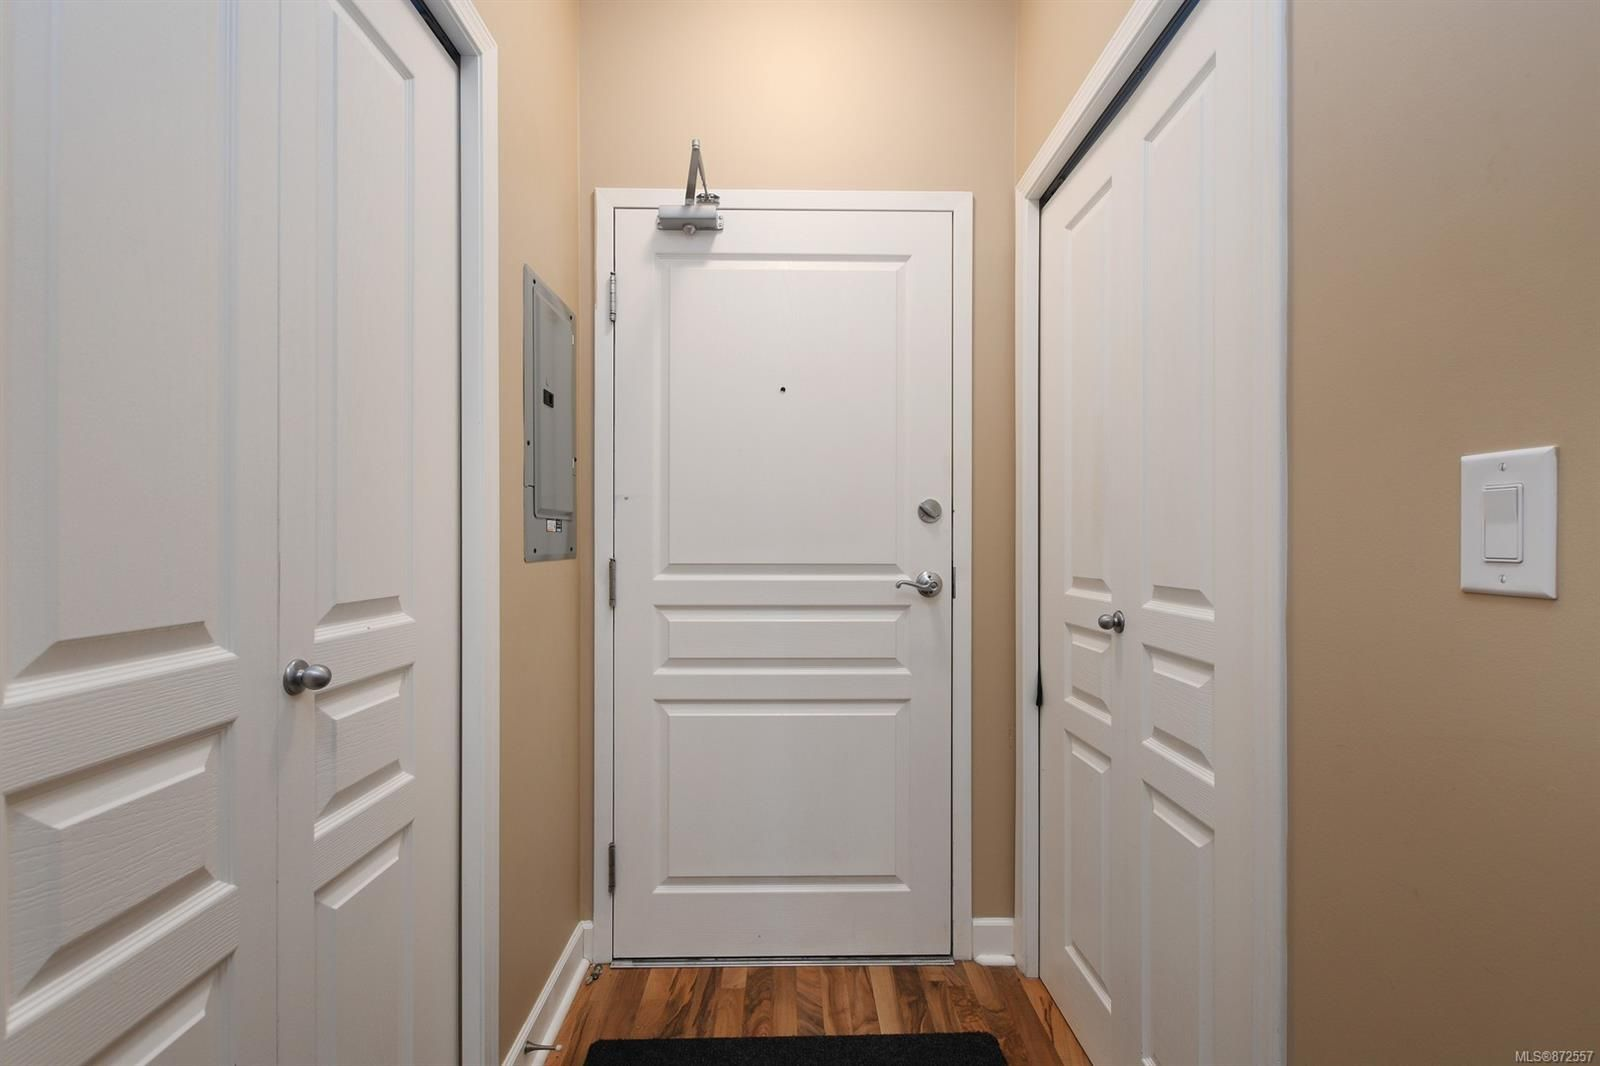 Photo 17: Photos: 411 825 Goldstream Ave in : La Langford Proper Condo for sale (Langford)  : MLS®# 872557